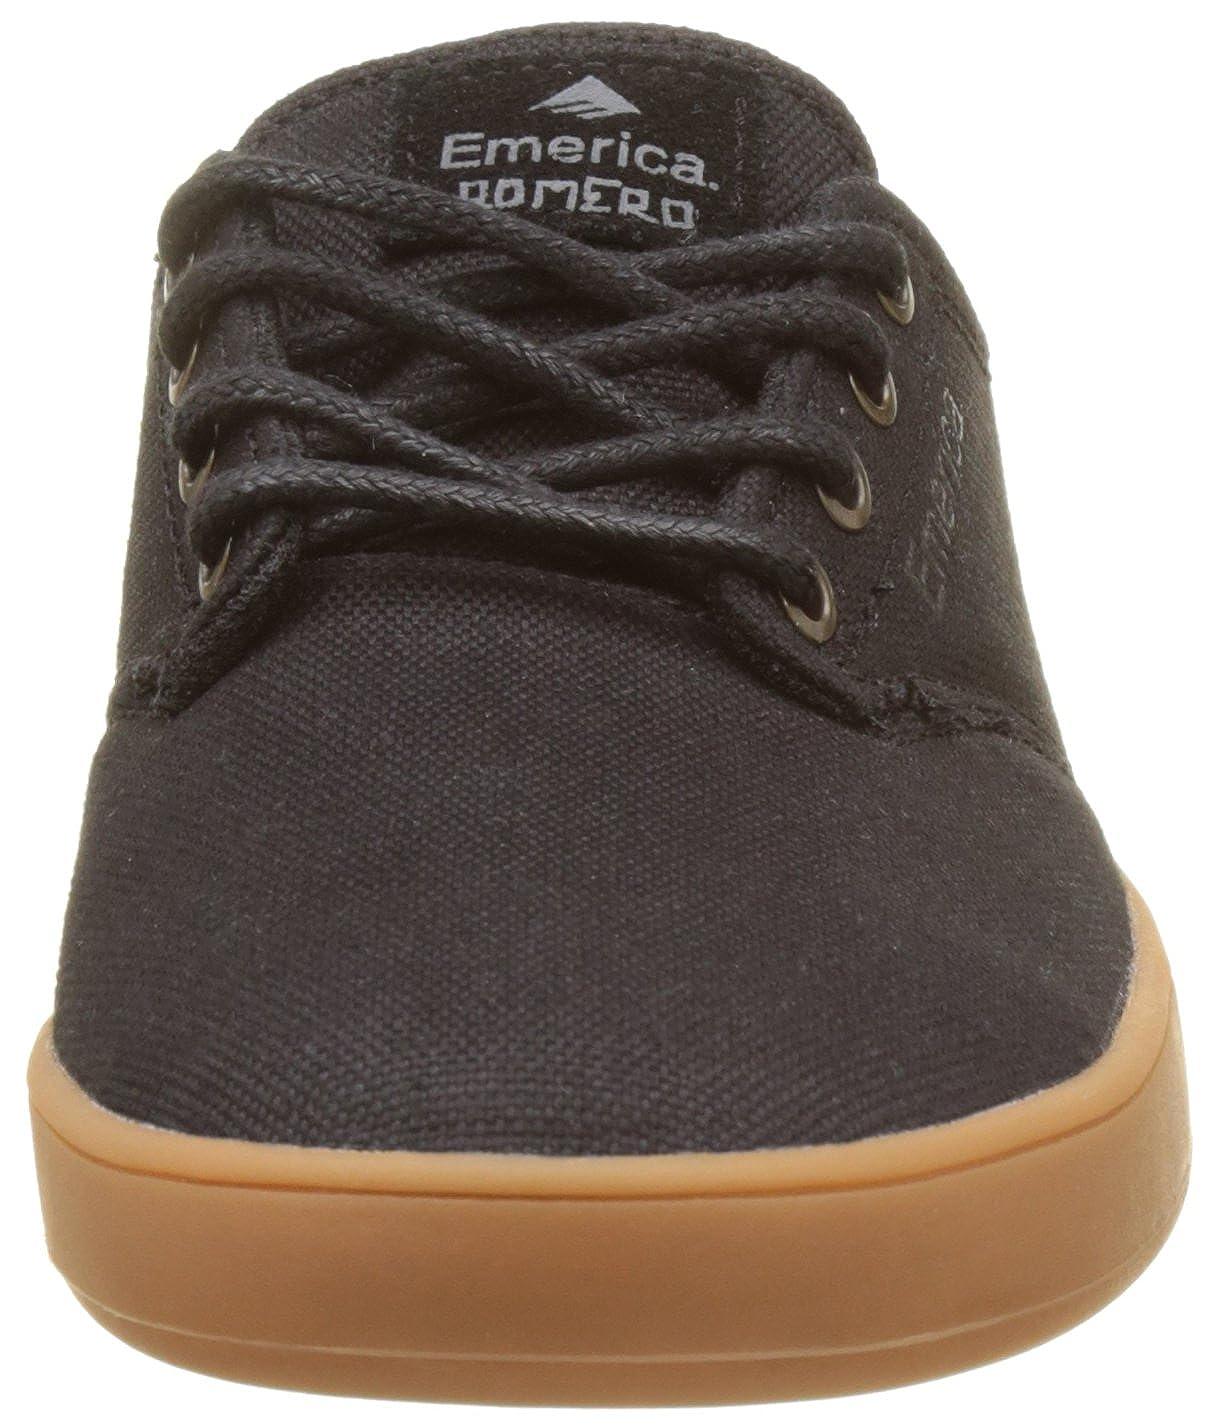 Emerica Herren The Romero Laced schwarz grau grau grau Gum Skateboardschuhe Schwarz 13ce51